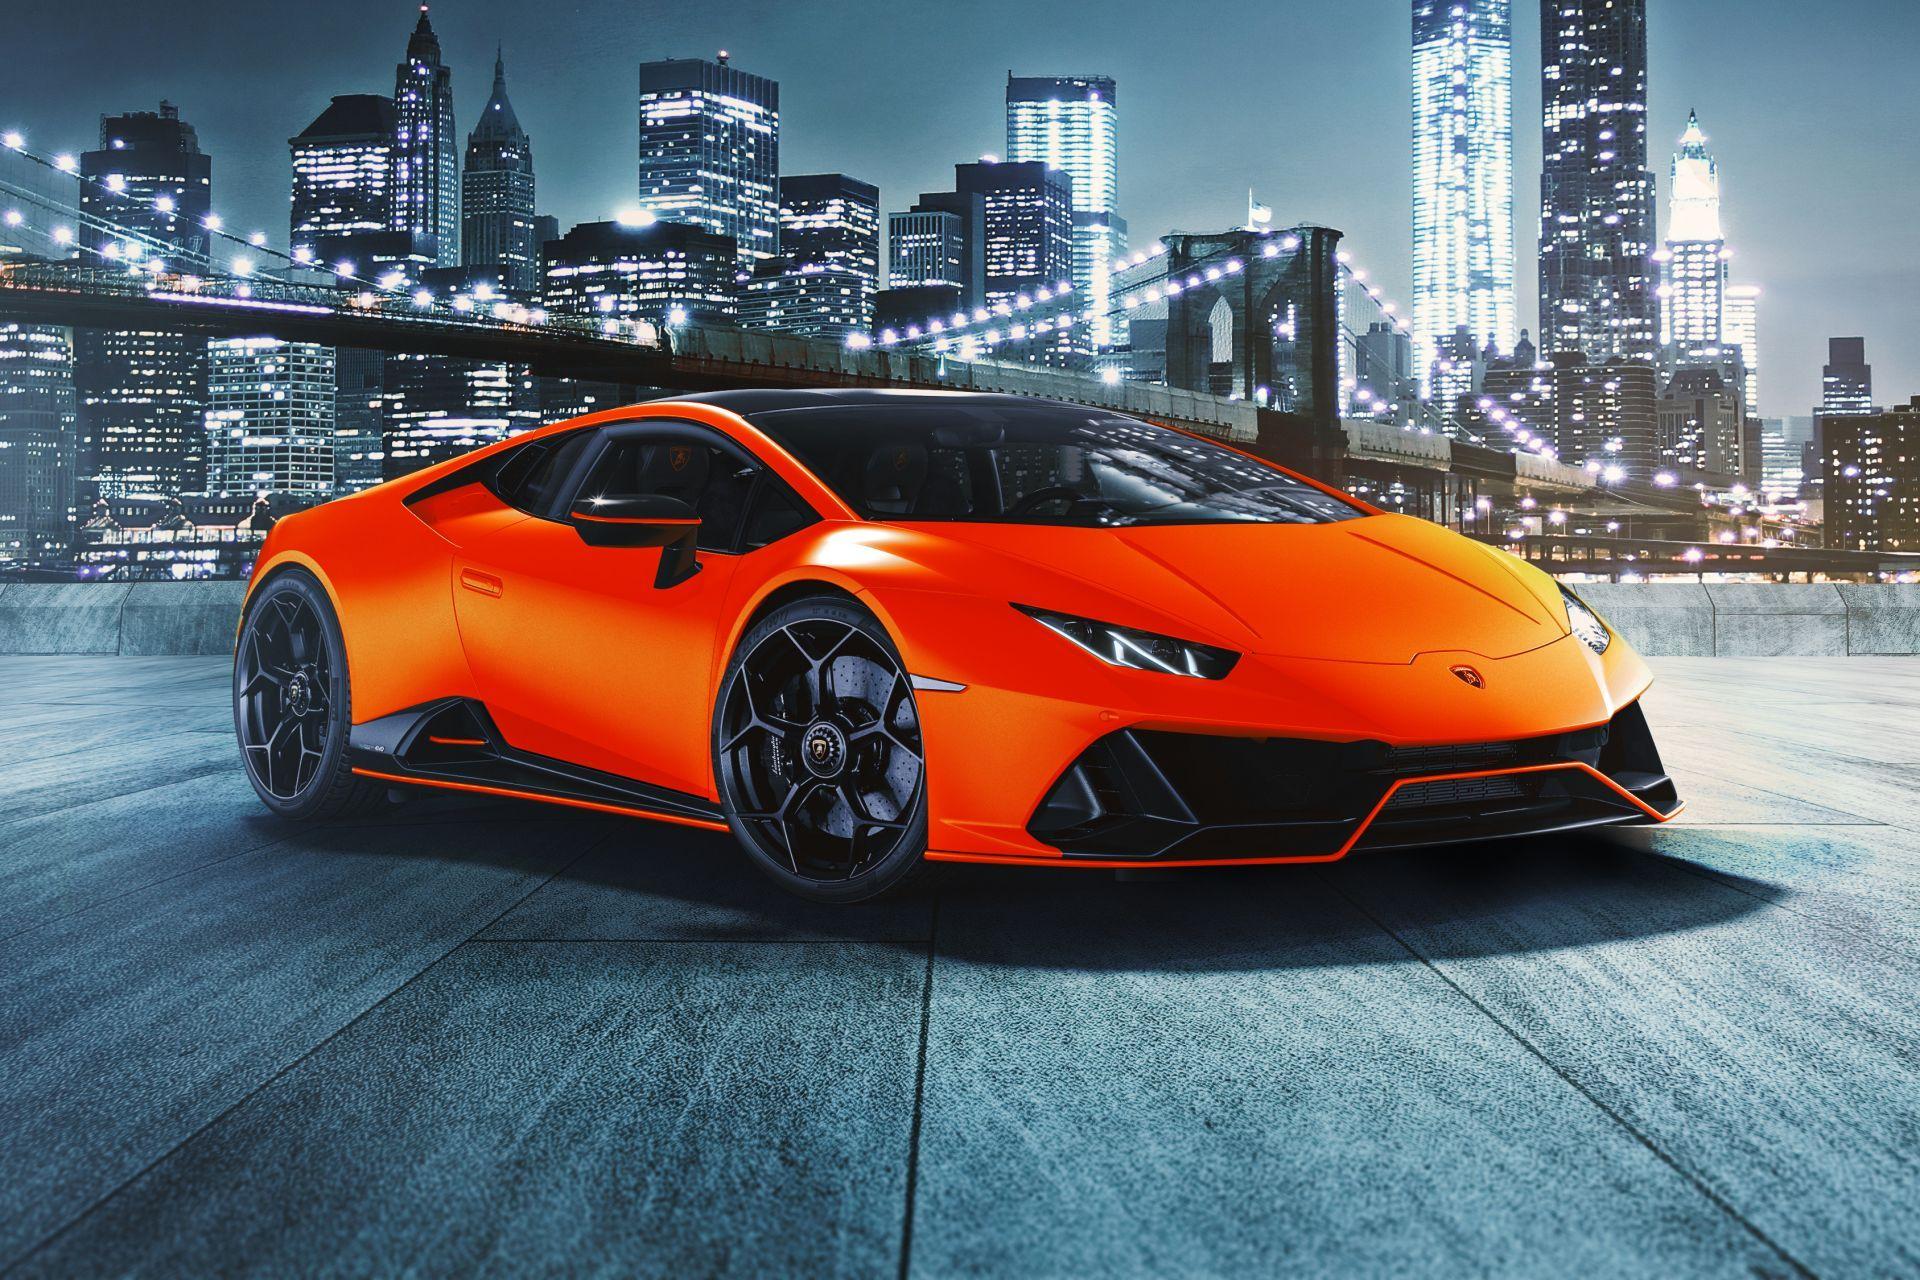 Lamborghini-Huracan-Evo-Fluo-Capsule-10